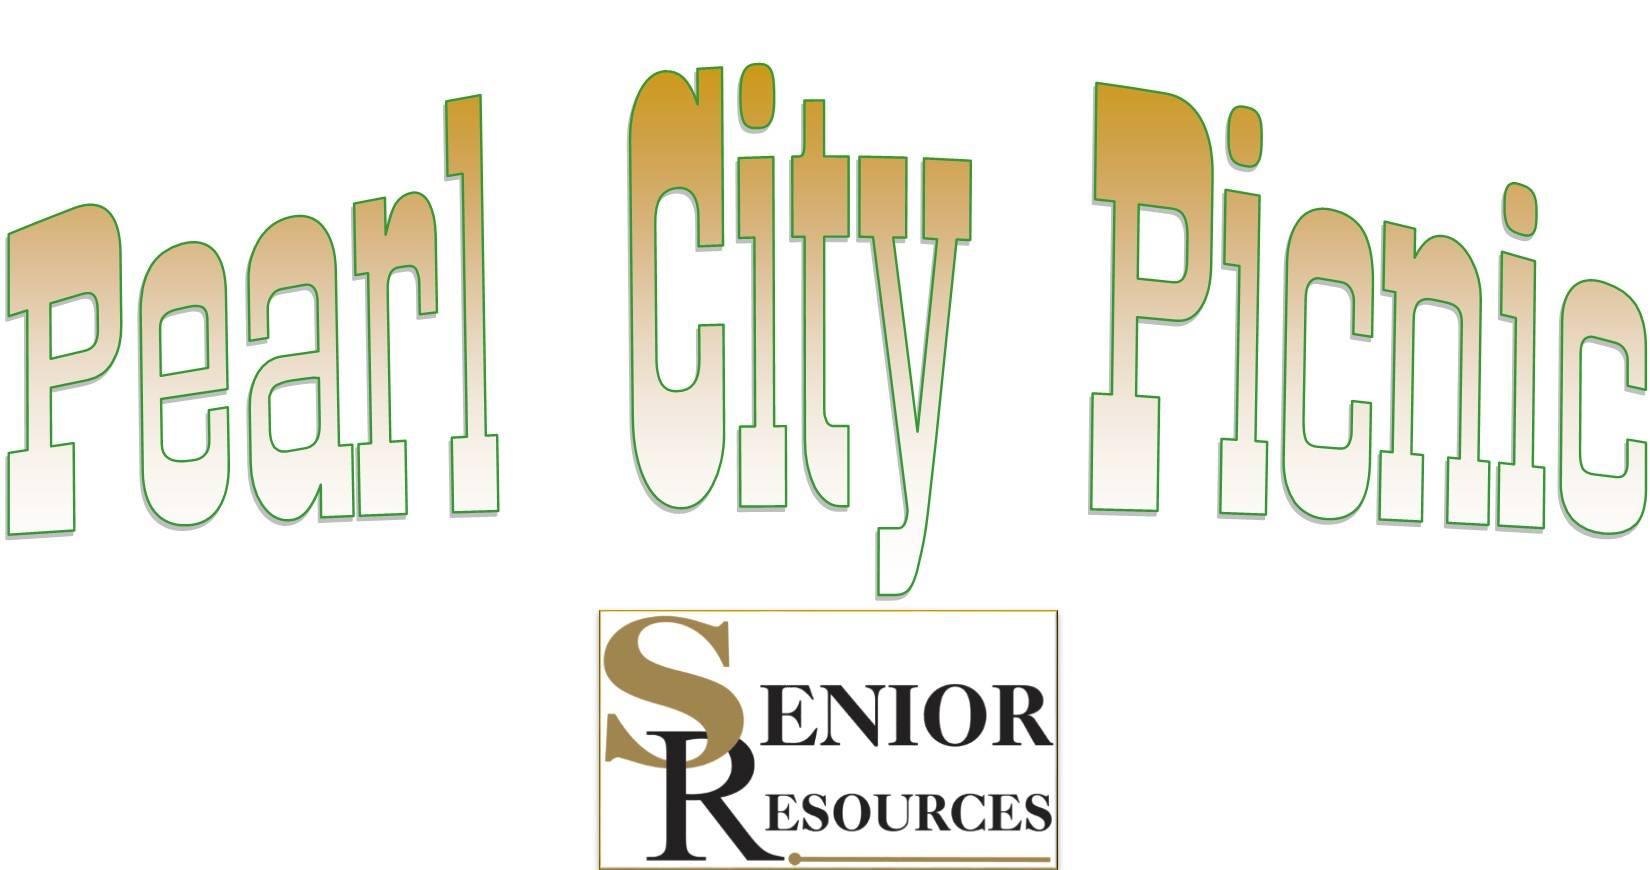 Pearl City Picnic